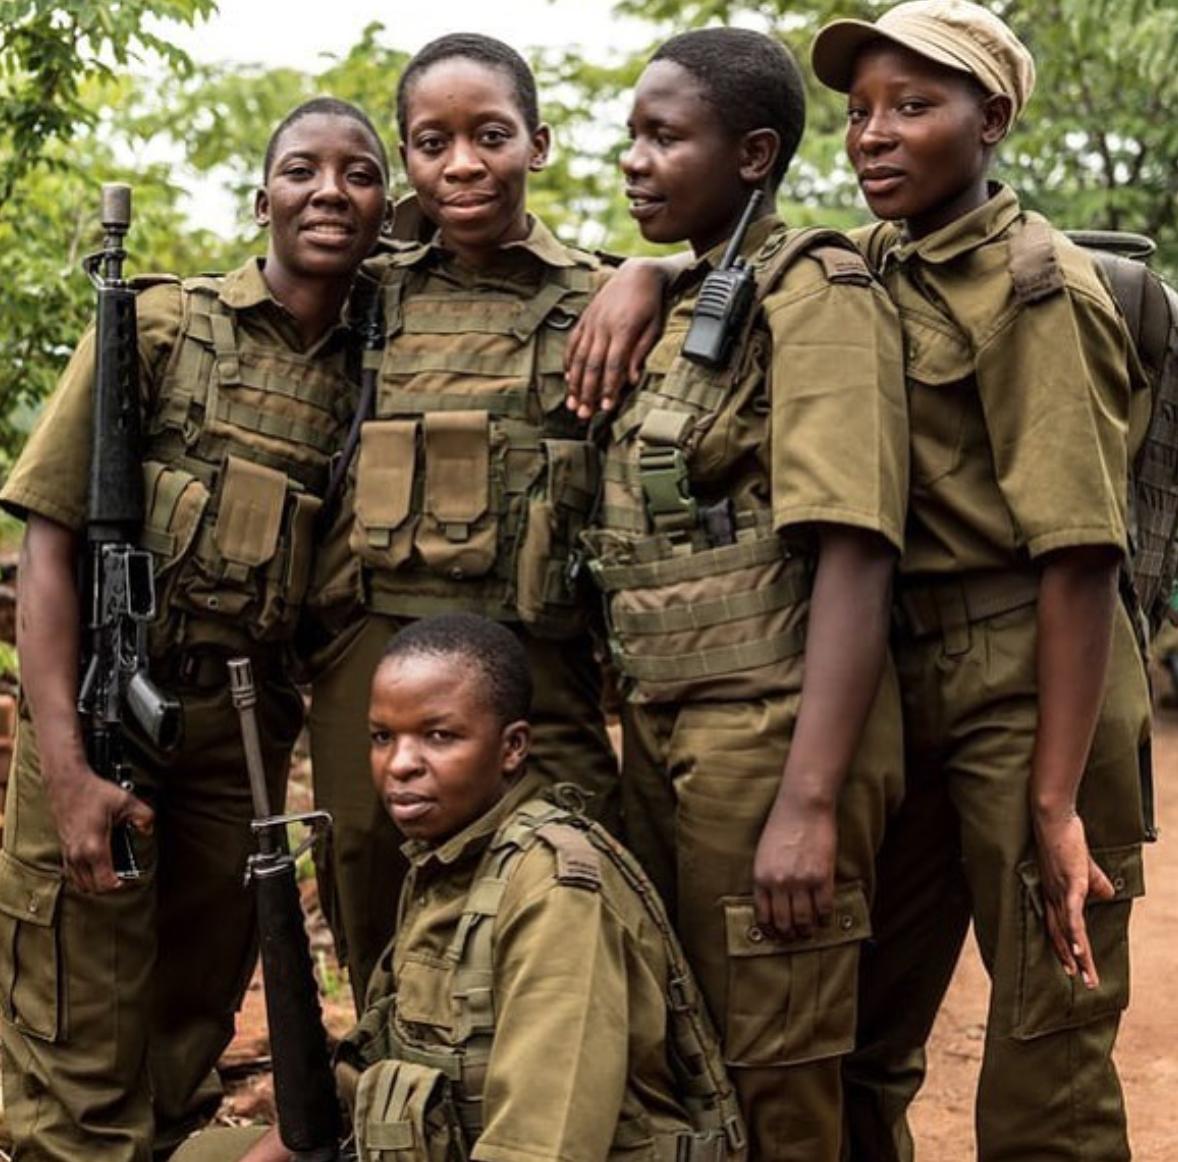 ENTITY discusses anti-poaching organizations in Zimbabwe.